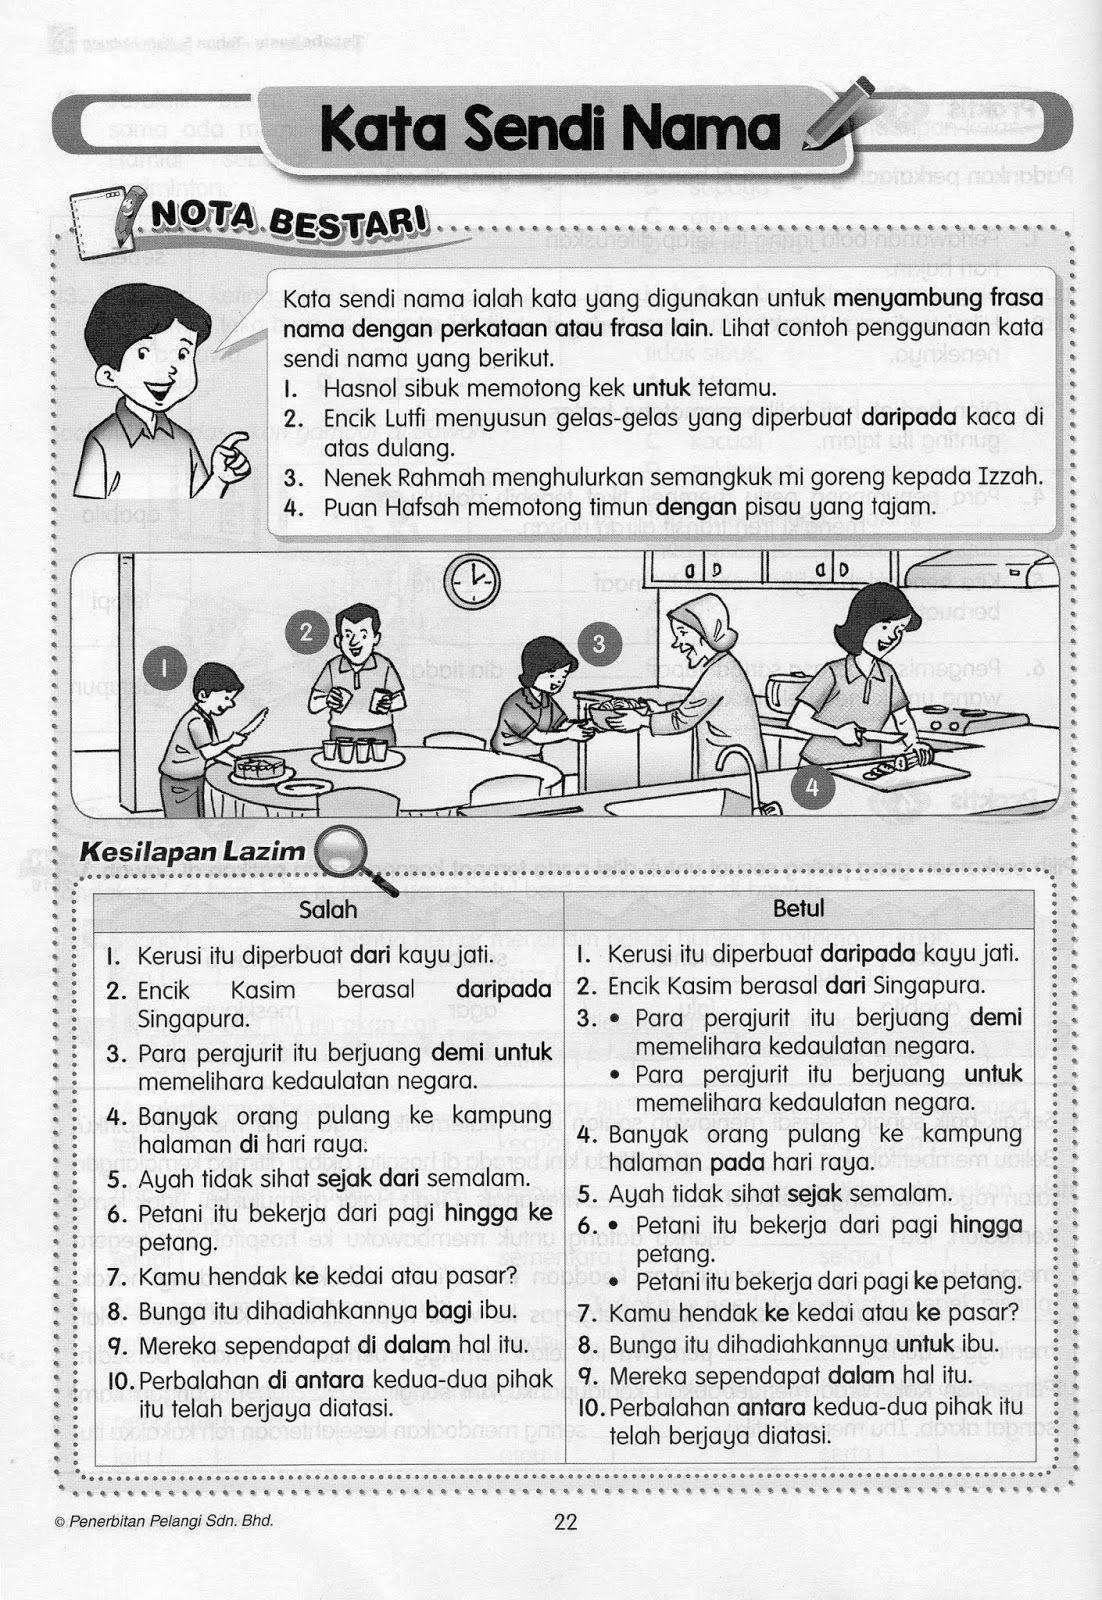 Nota Tatabahasa Bahasa Melayu In